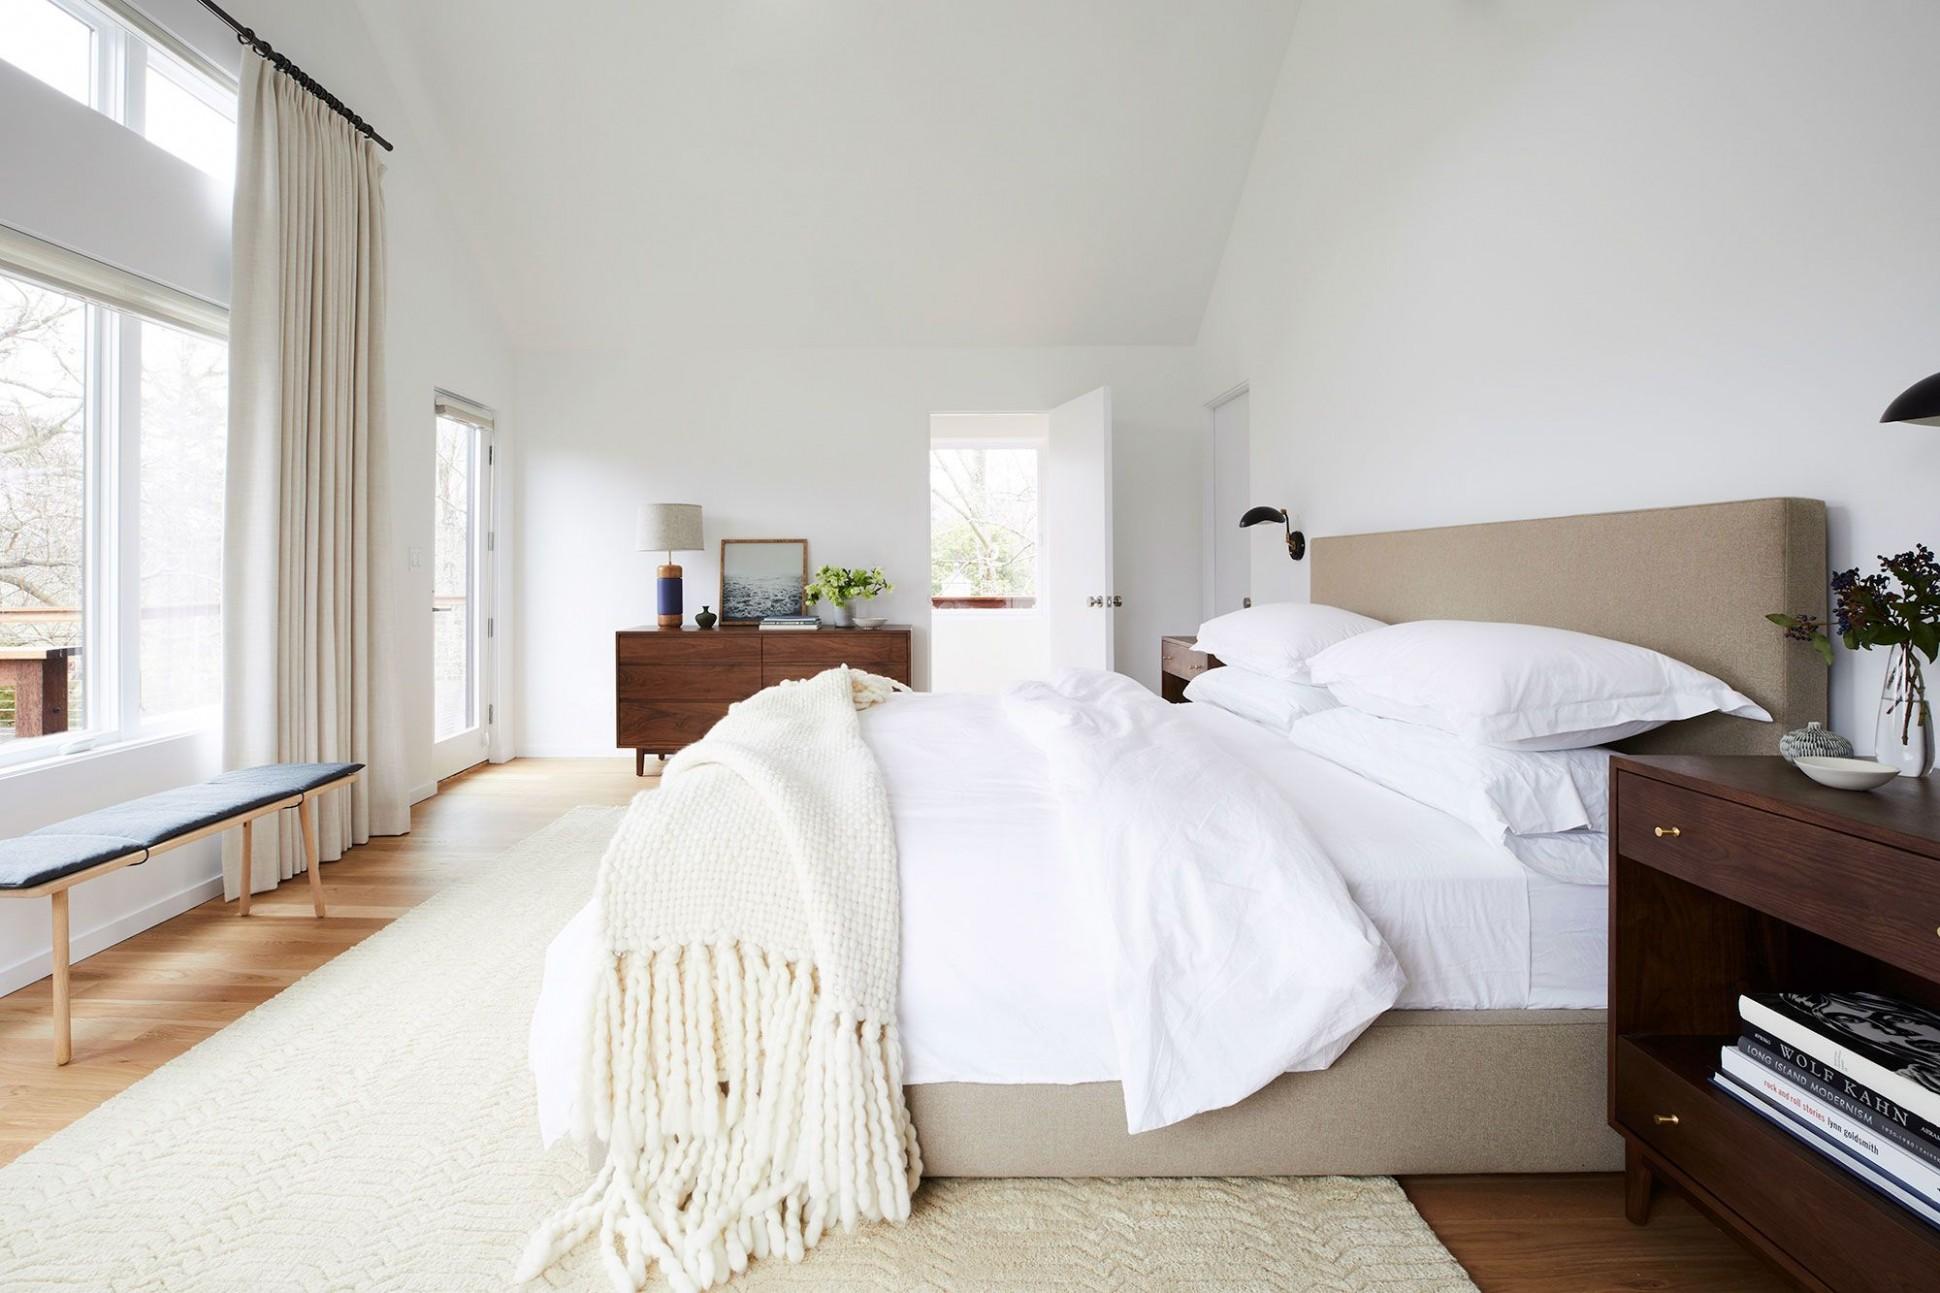 8 Cozy Bedroom Ideas - How To Make Your Bedroom Feel Cozy - Bedroom Ideas Cozy